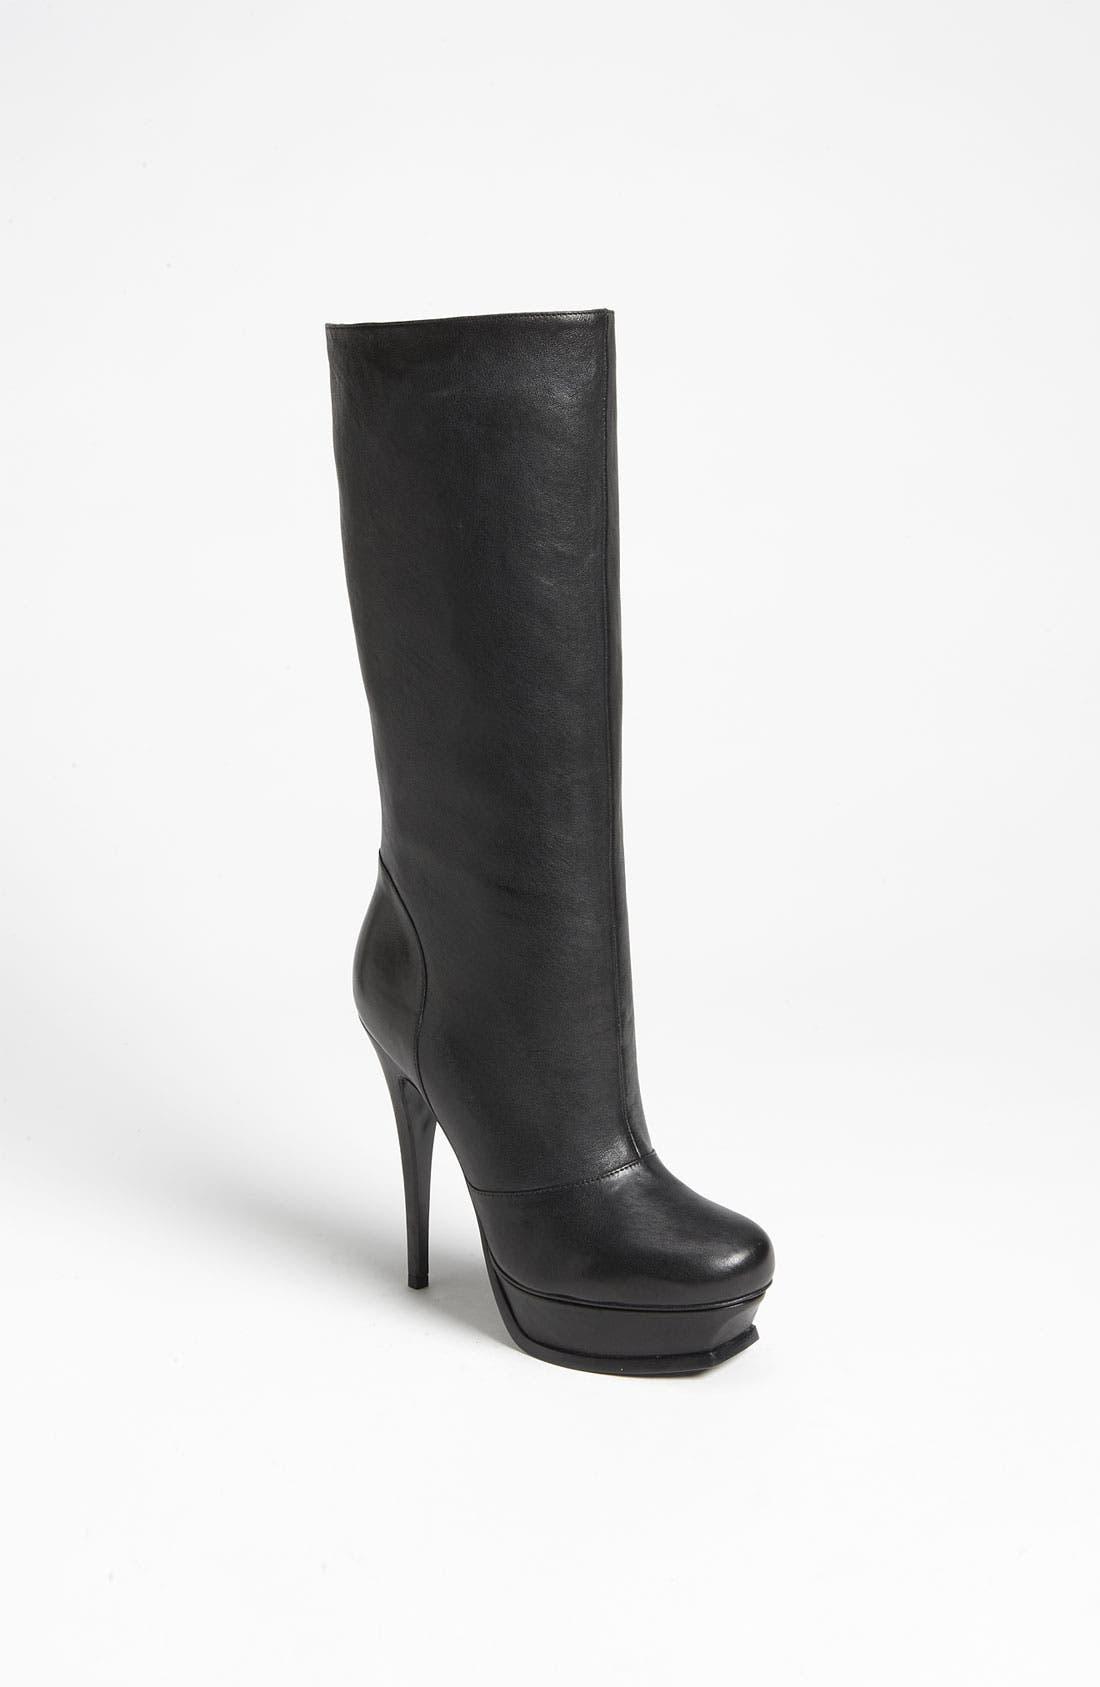 Main Image - Yves Saint Laurent 'Tribute' Boot